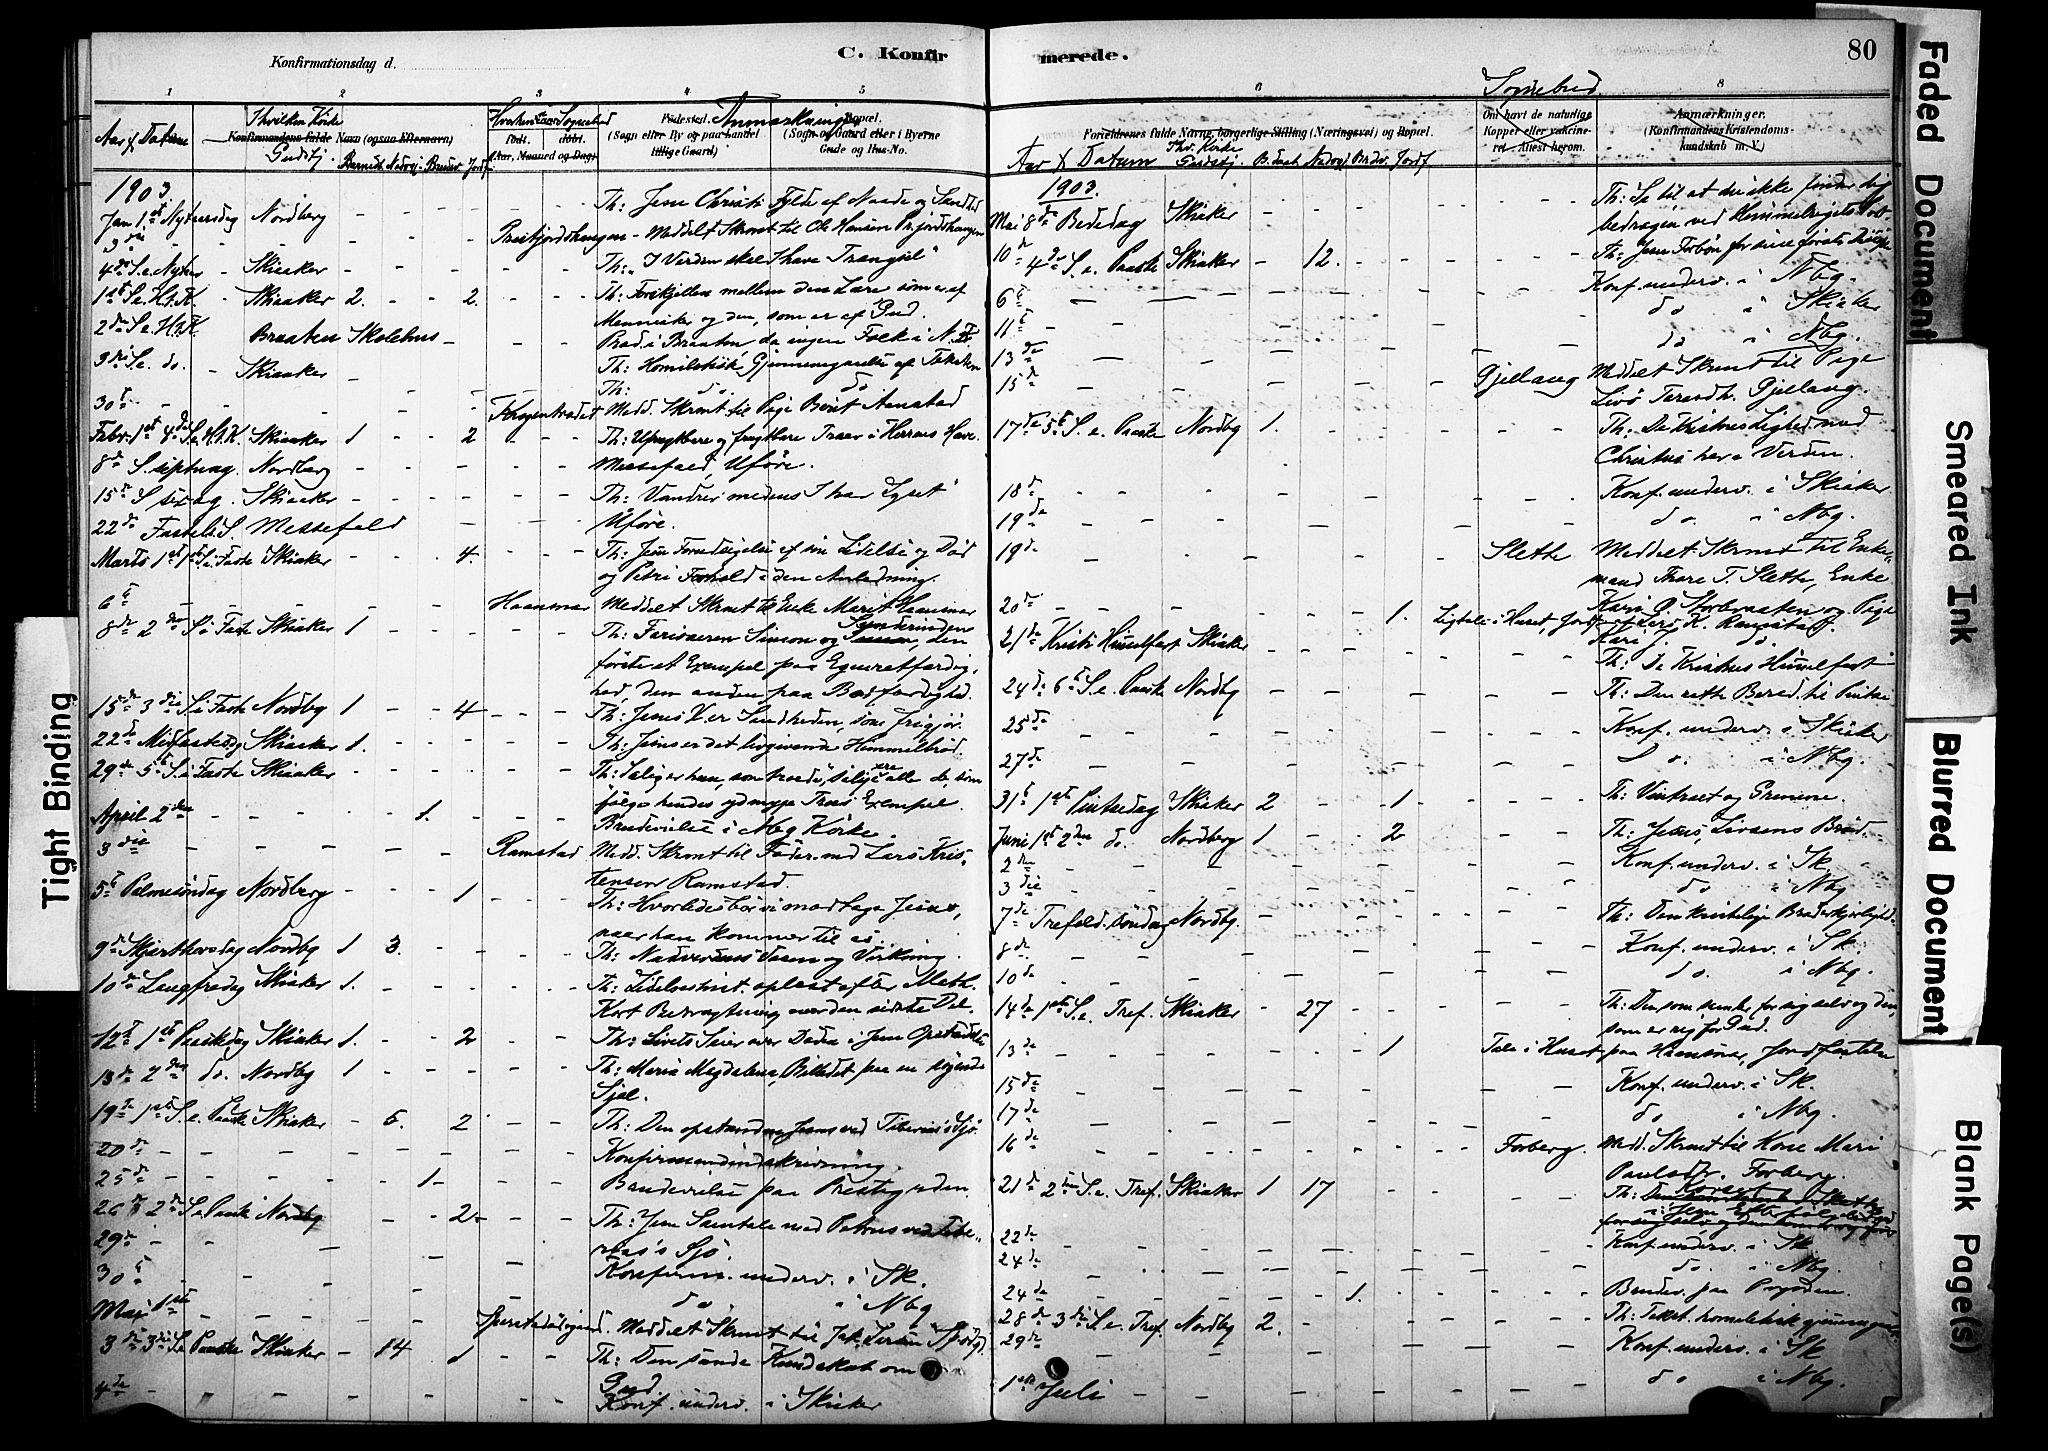 SAH, Skjåk prestekontor, Ministerialbok nr. 2, 1878-1907, s. 80